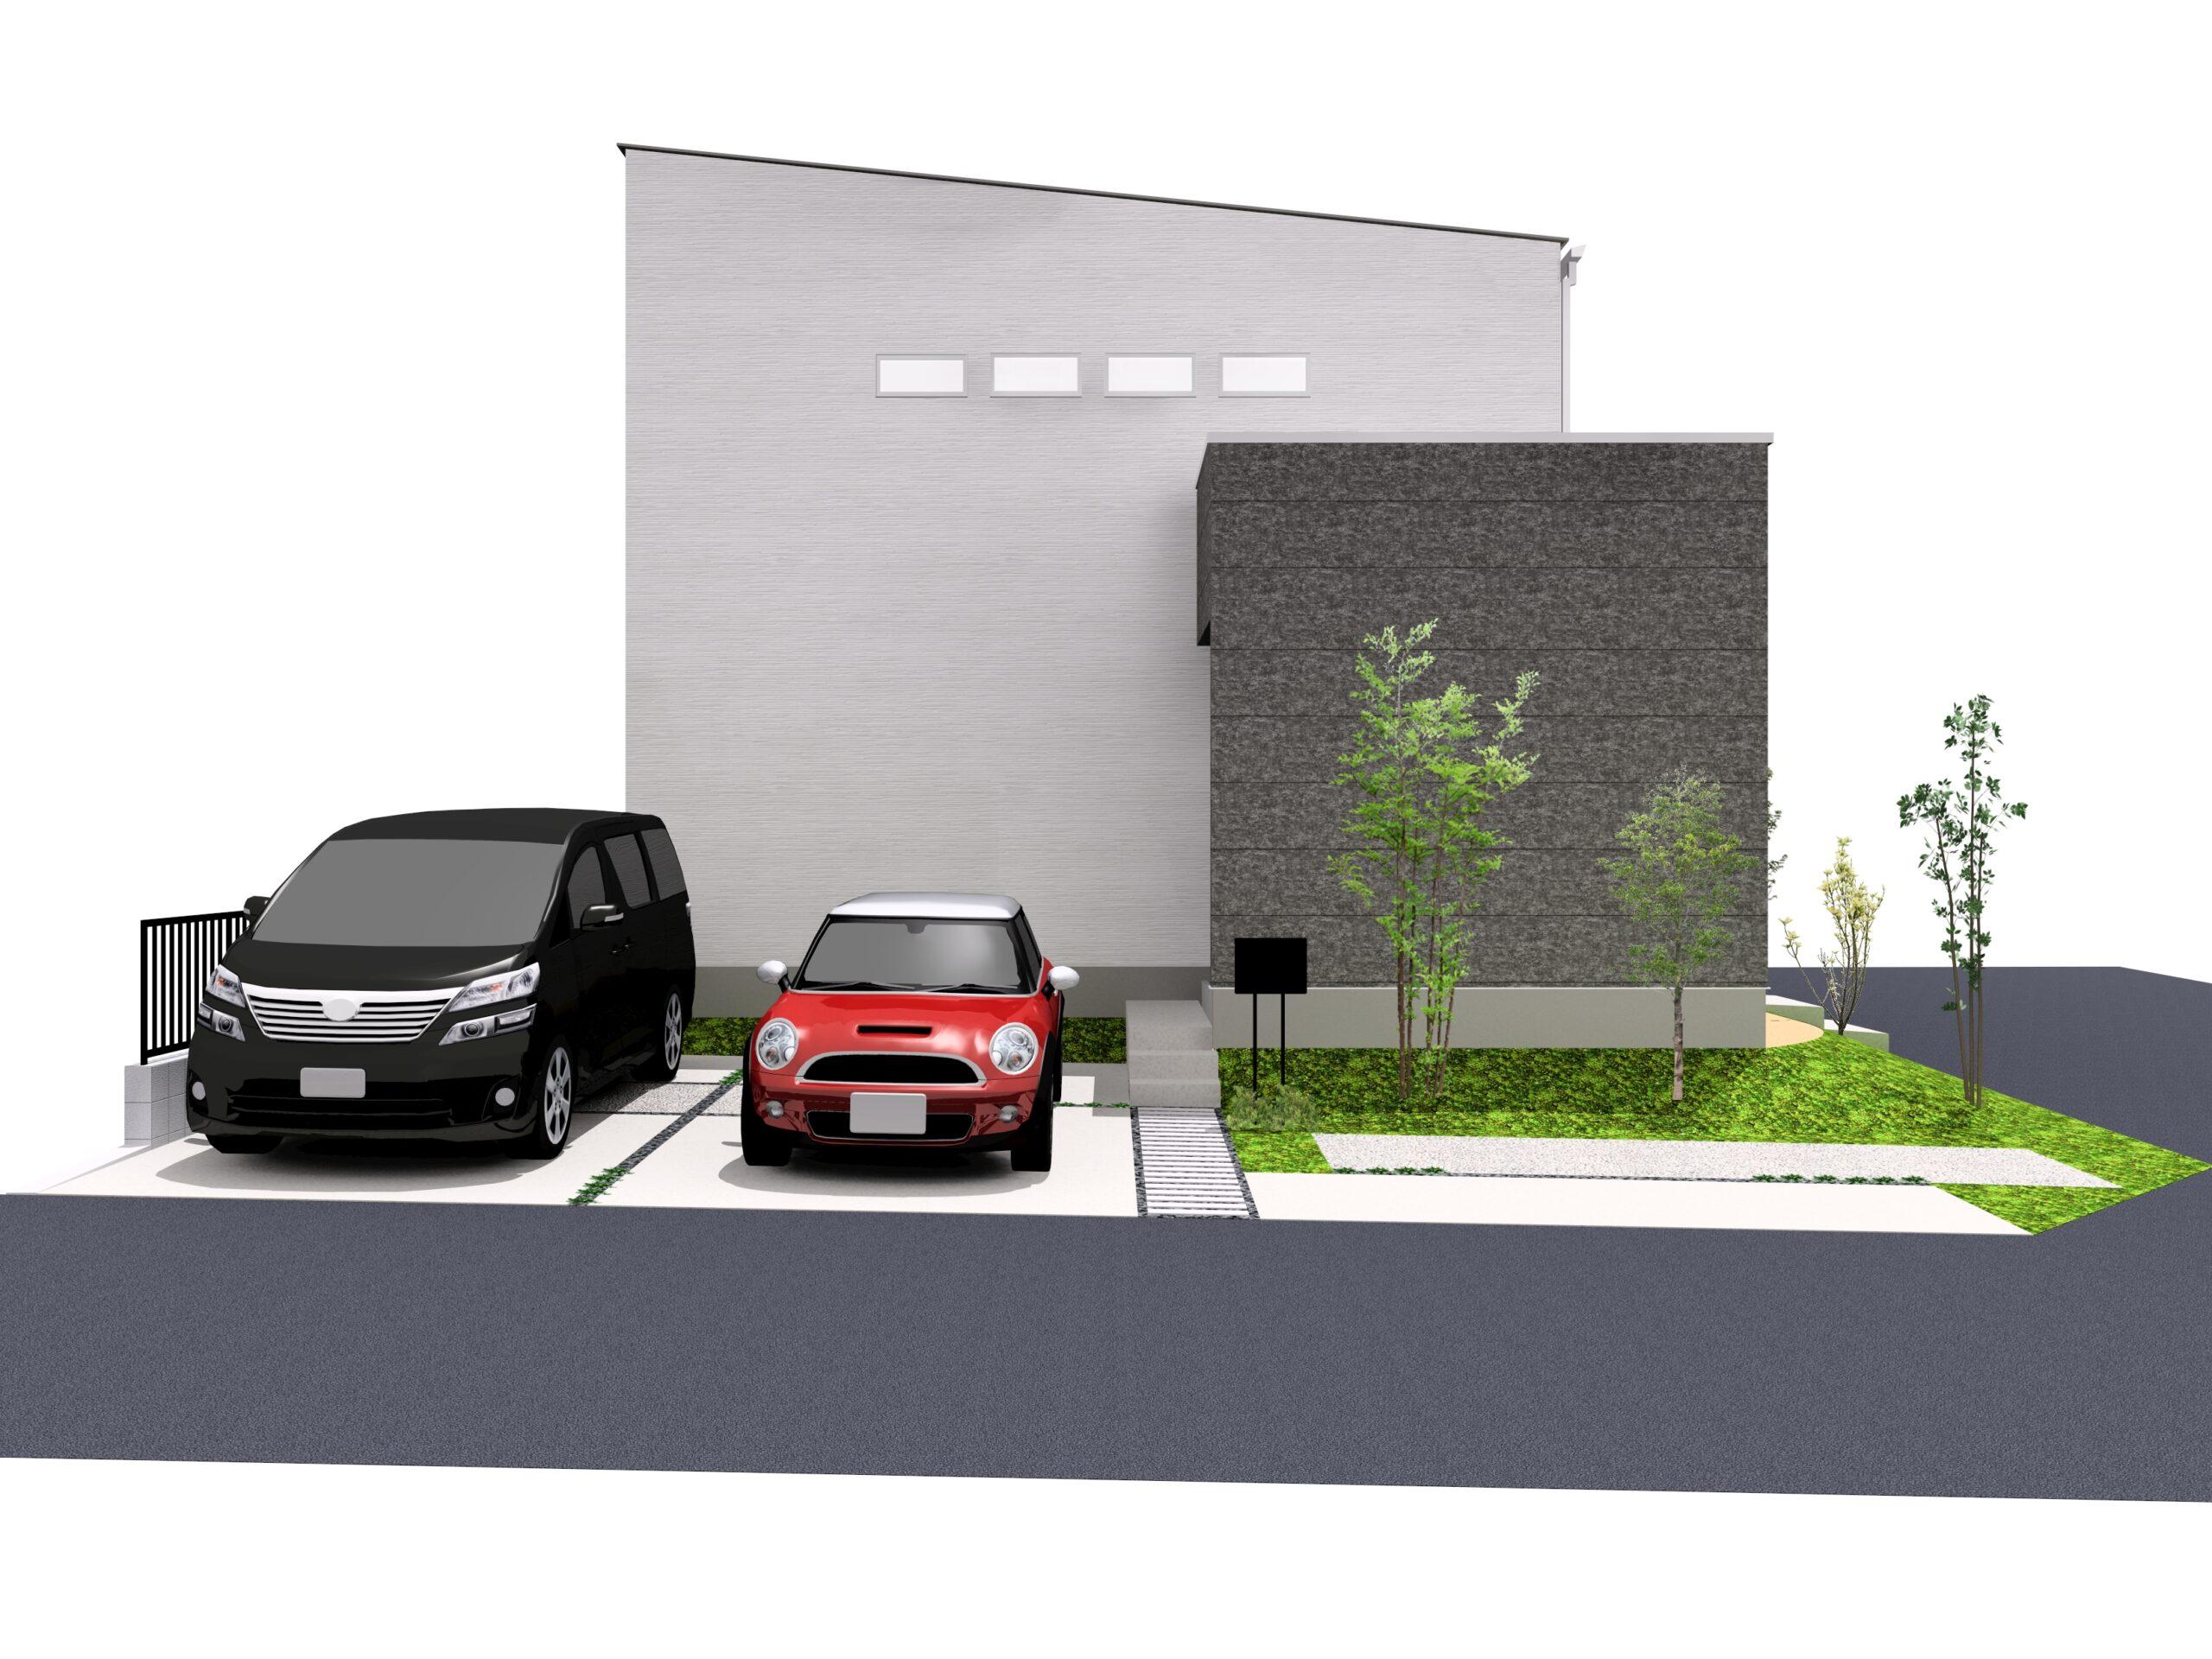 嬉野市新築建売住宅「OURS下野1号地」外観パース